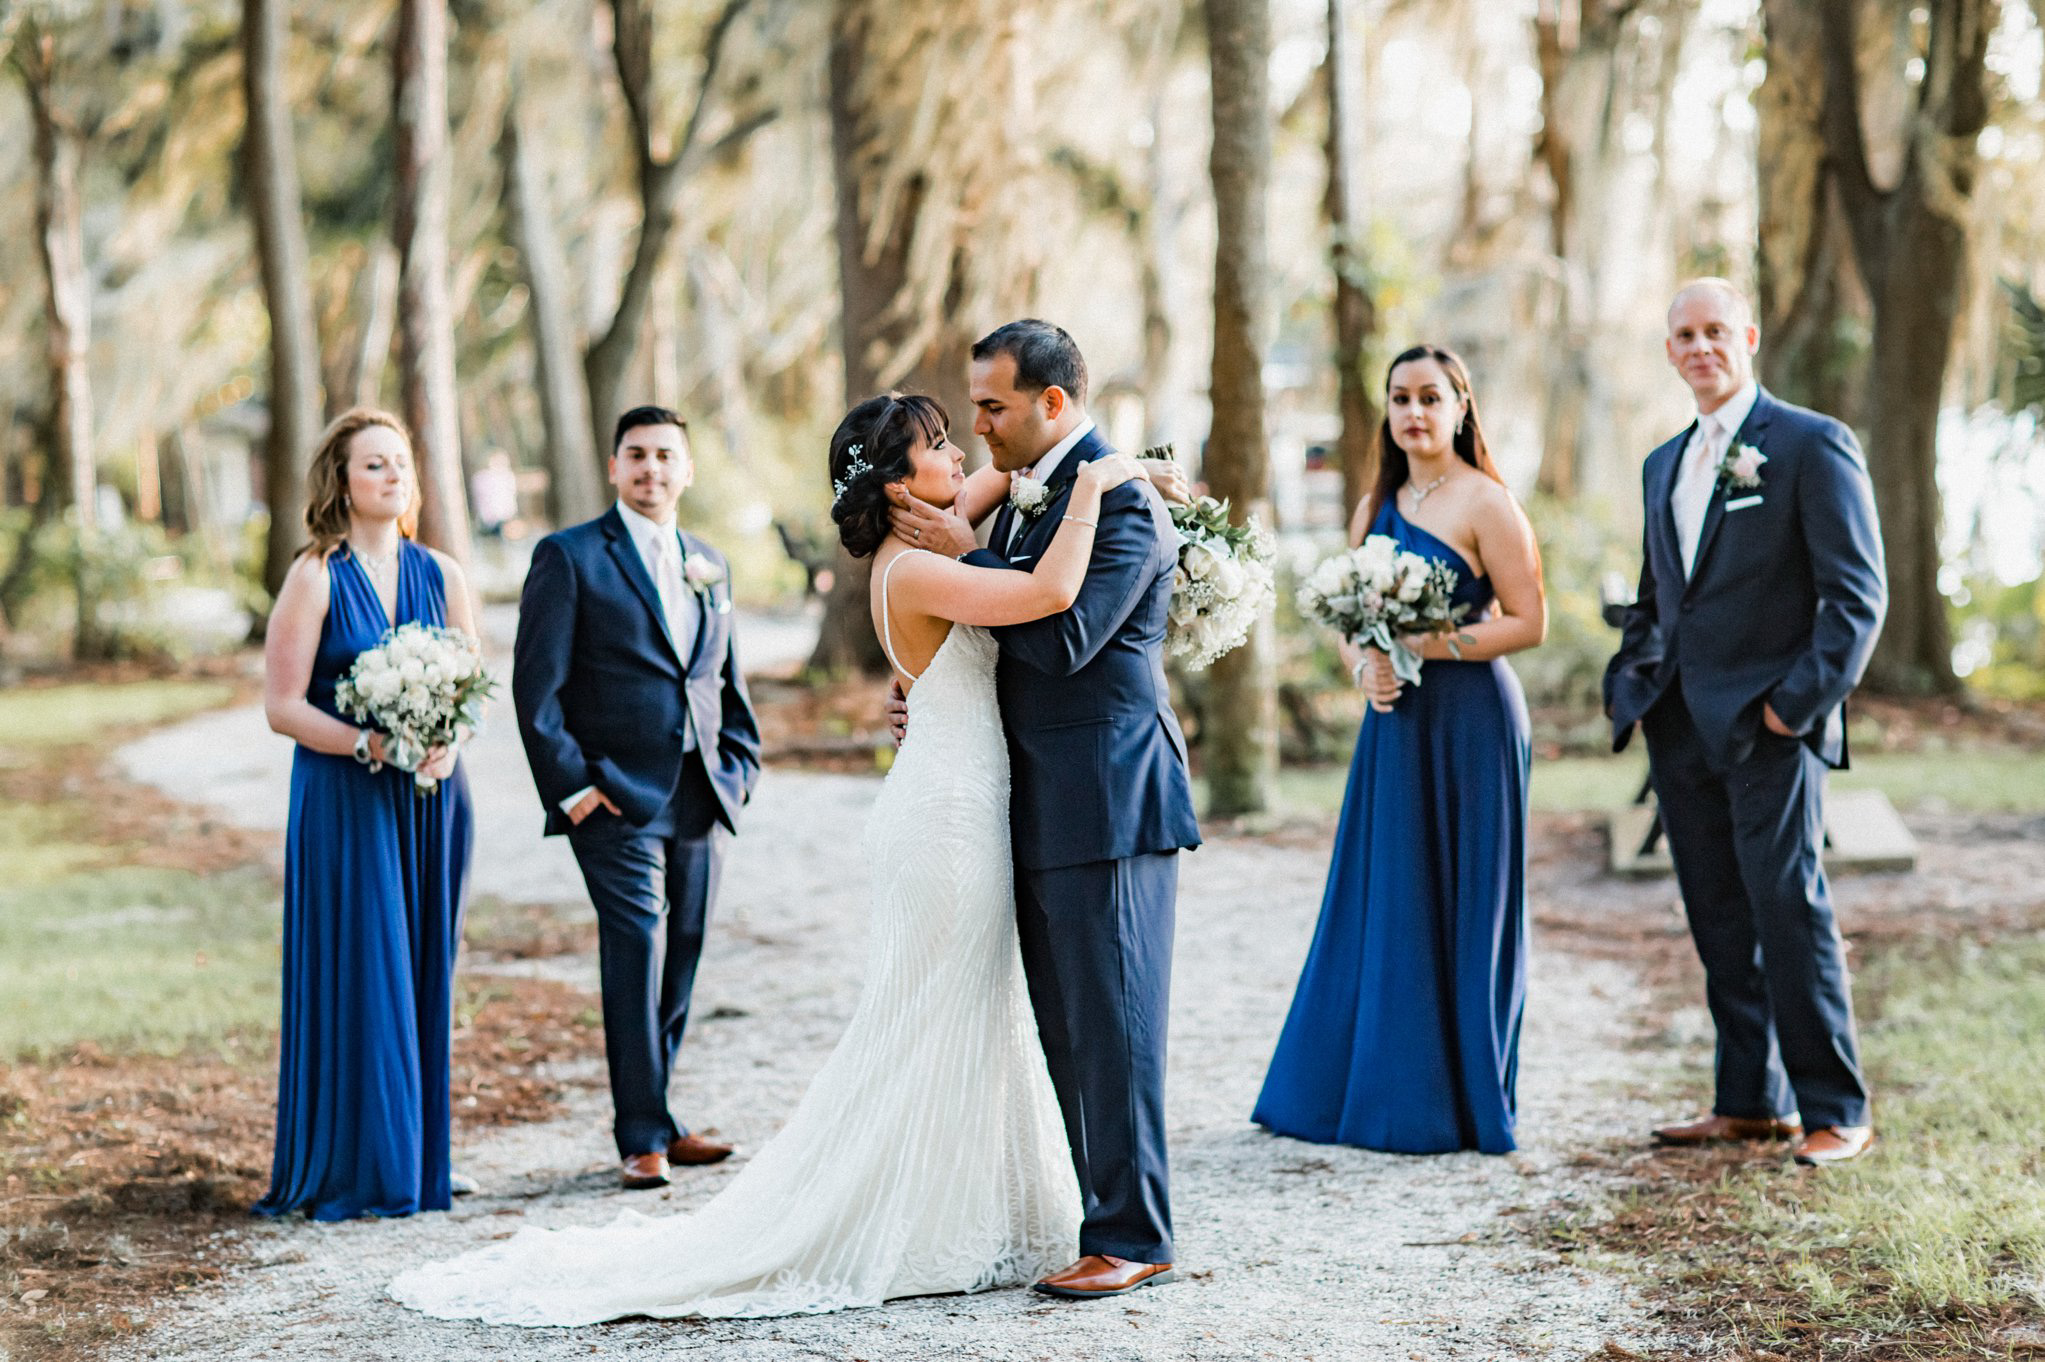 Romantic Secret Garden Navy + Pink Wedding with Harpist- Kraft Azalea Gardens - The Alzates 52.jpg